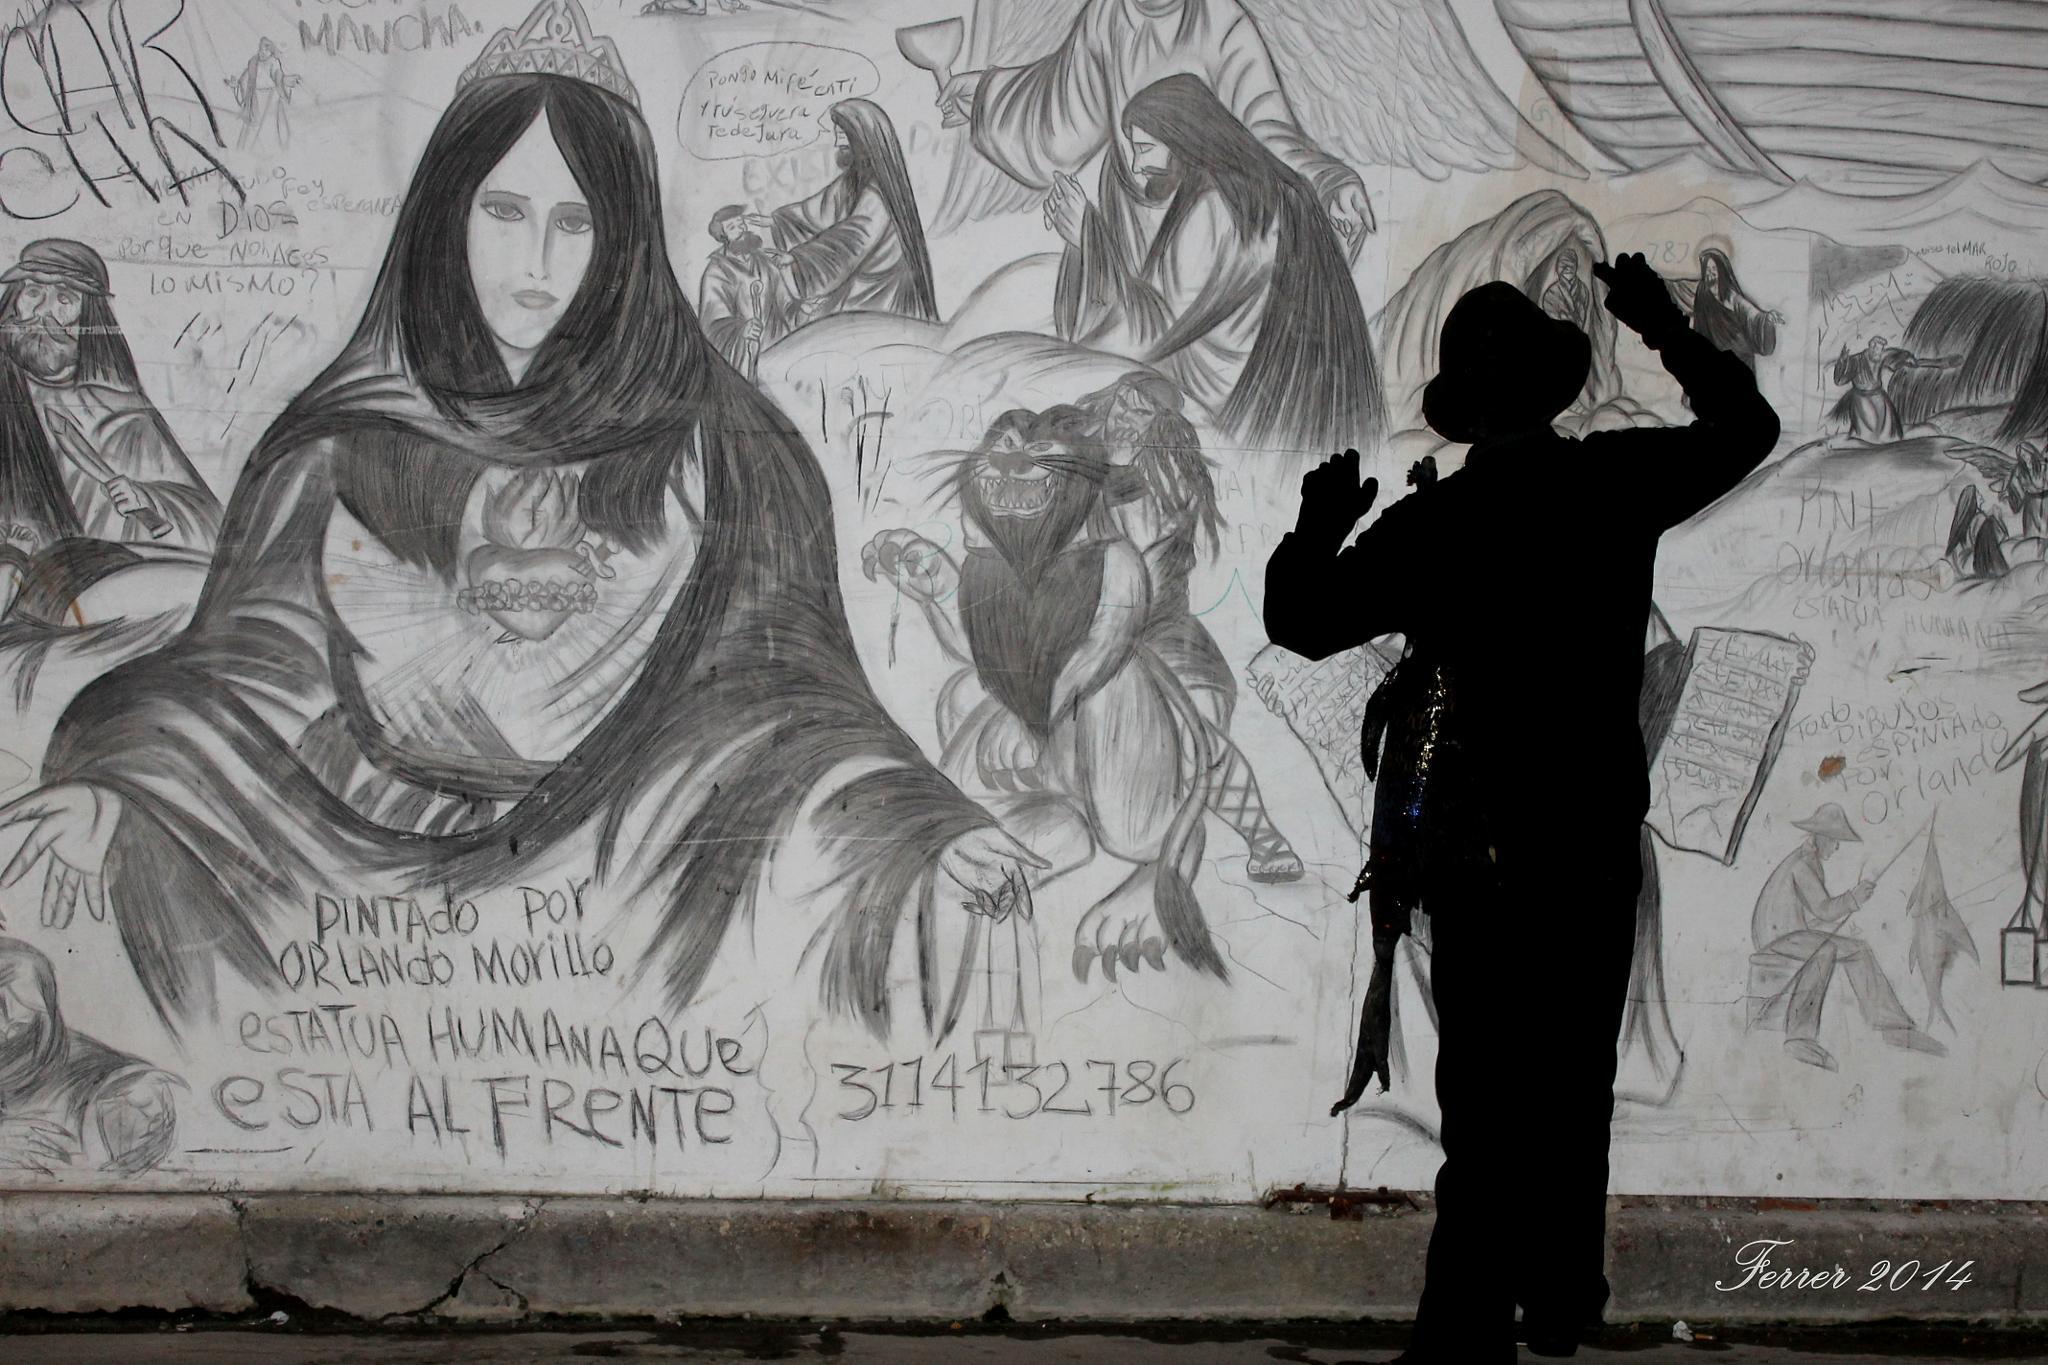 HACEDOR DE GRAFFITI by PALOMAGAR